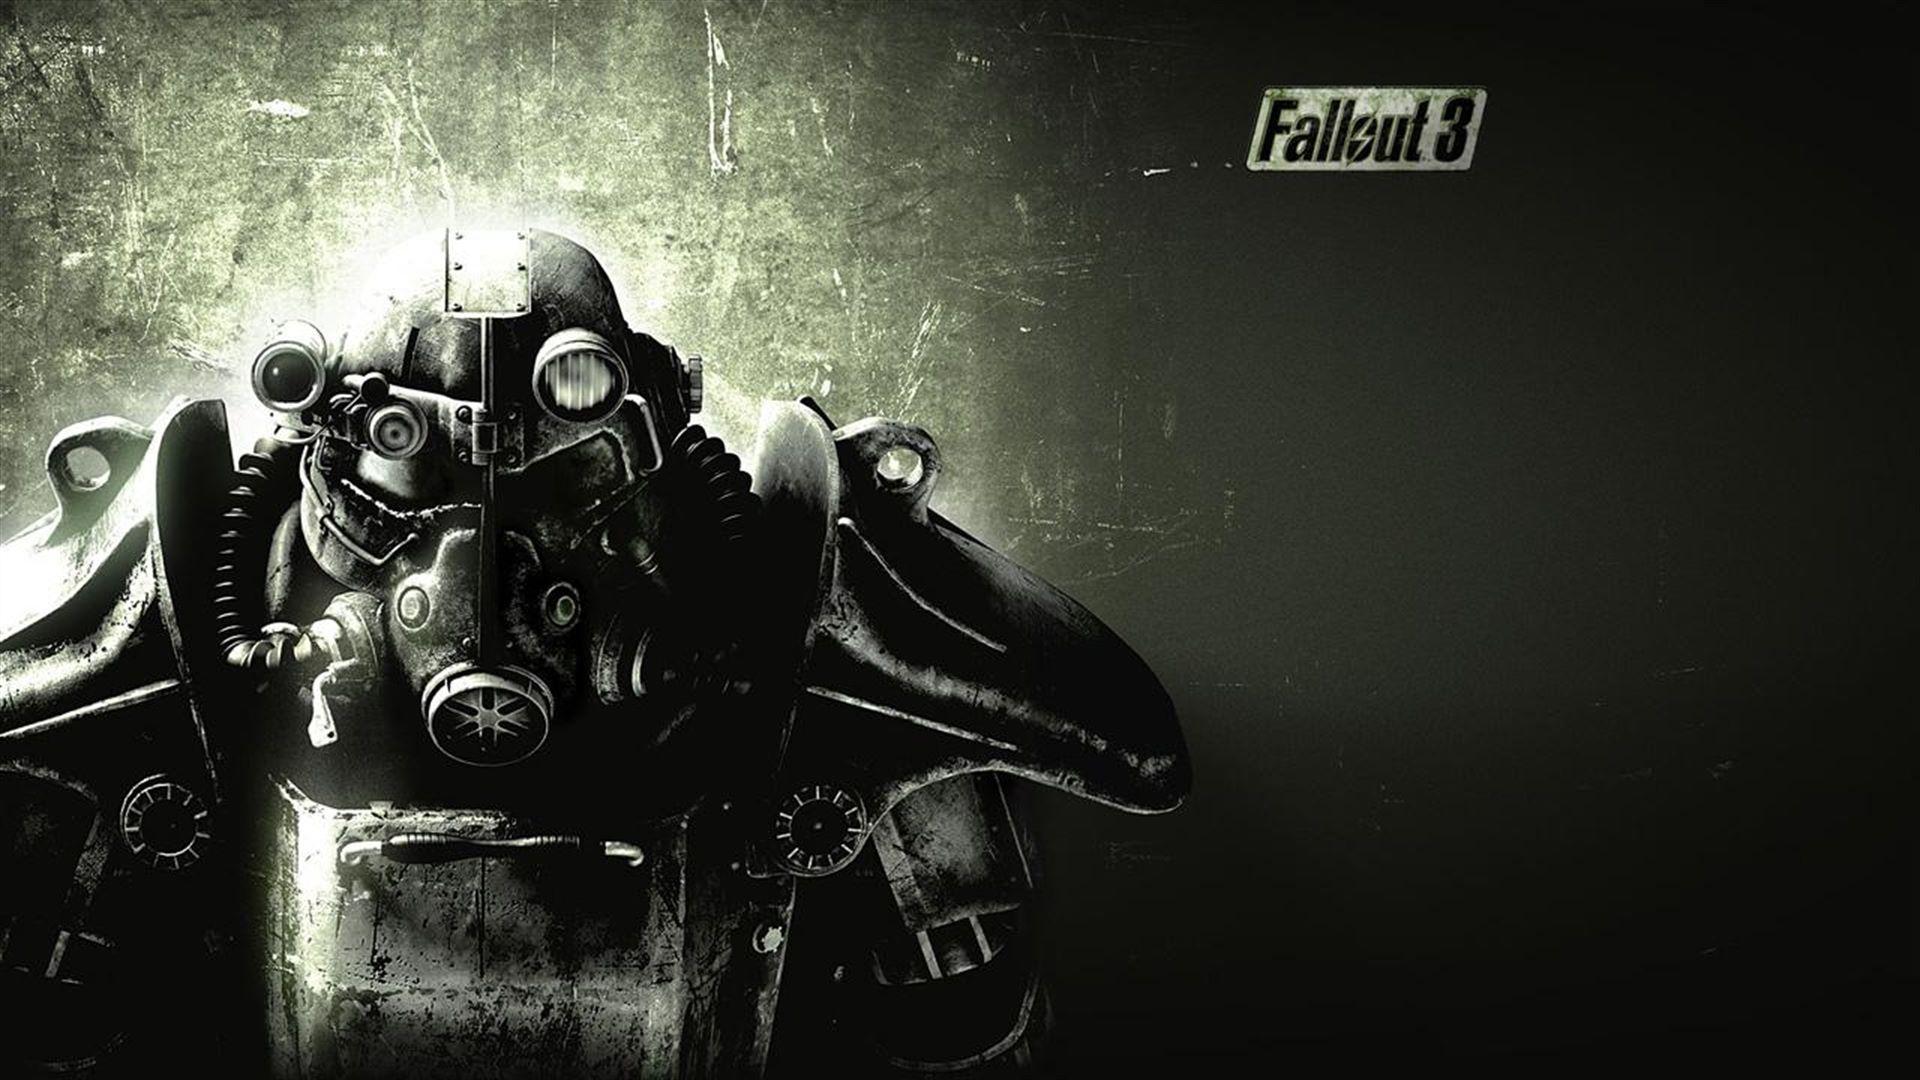 Buy Fallout 3